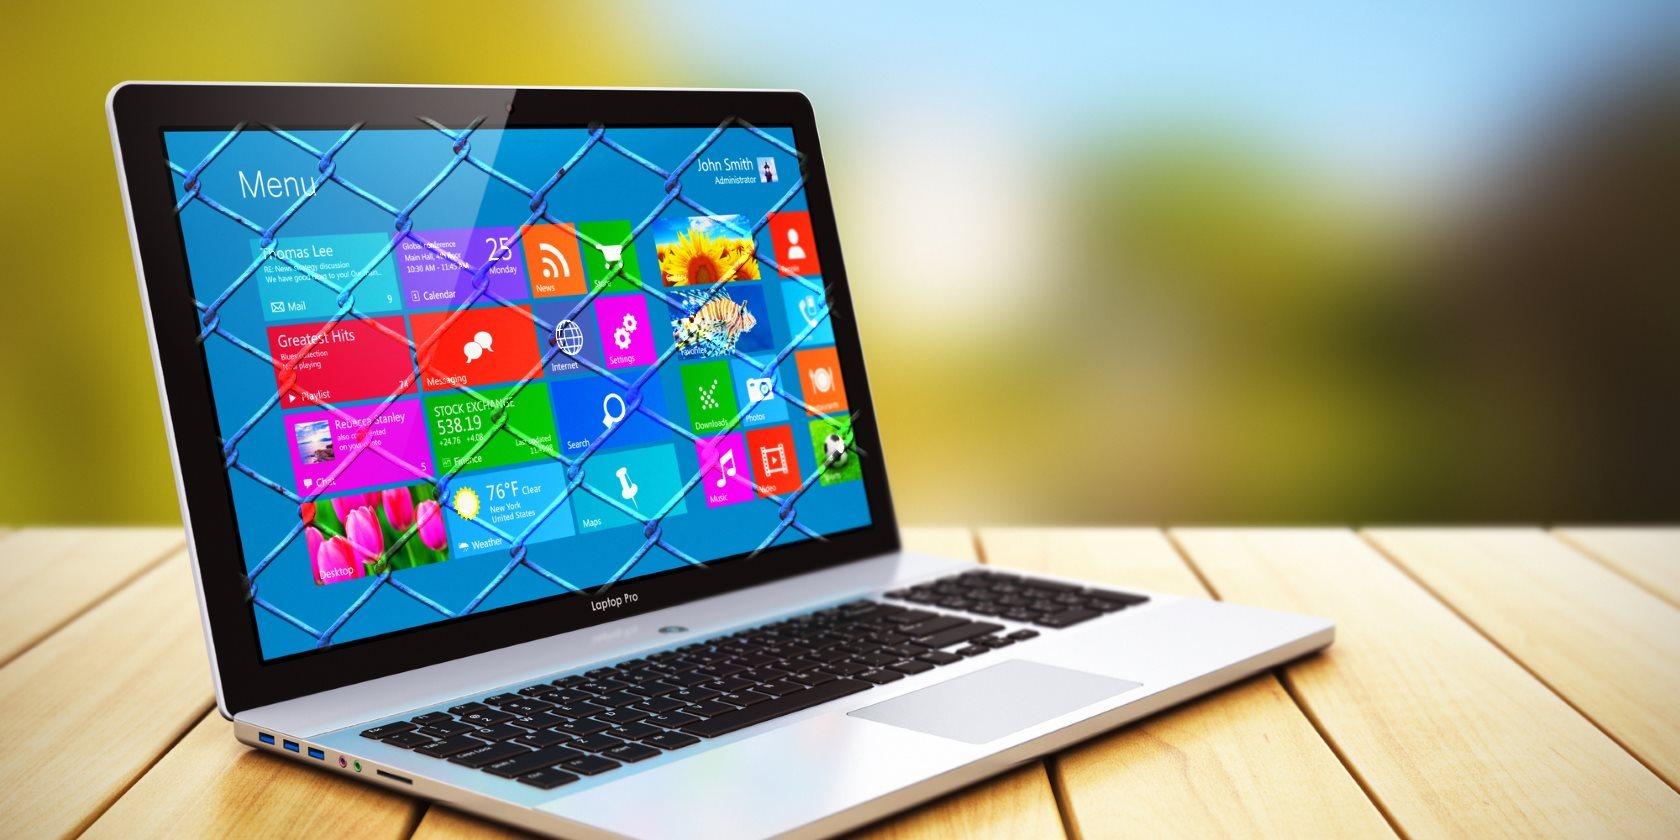 The 7 Best Free Alternatives to Fences for Windows Desktop Management